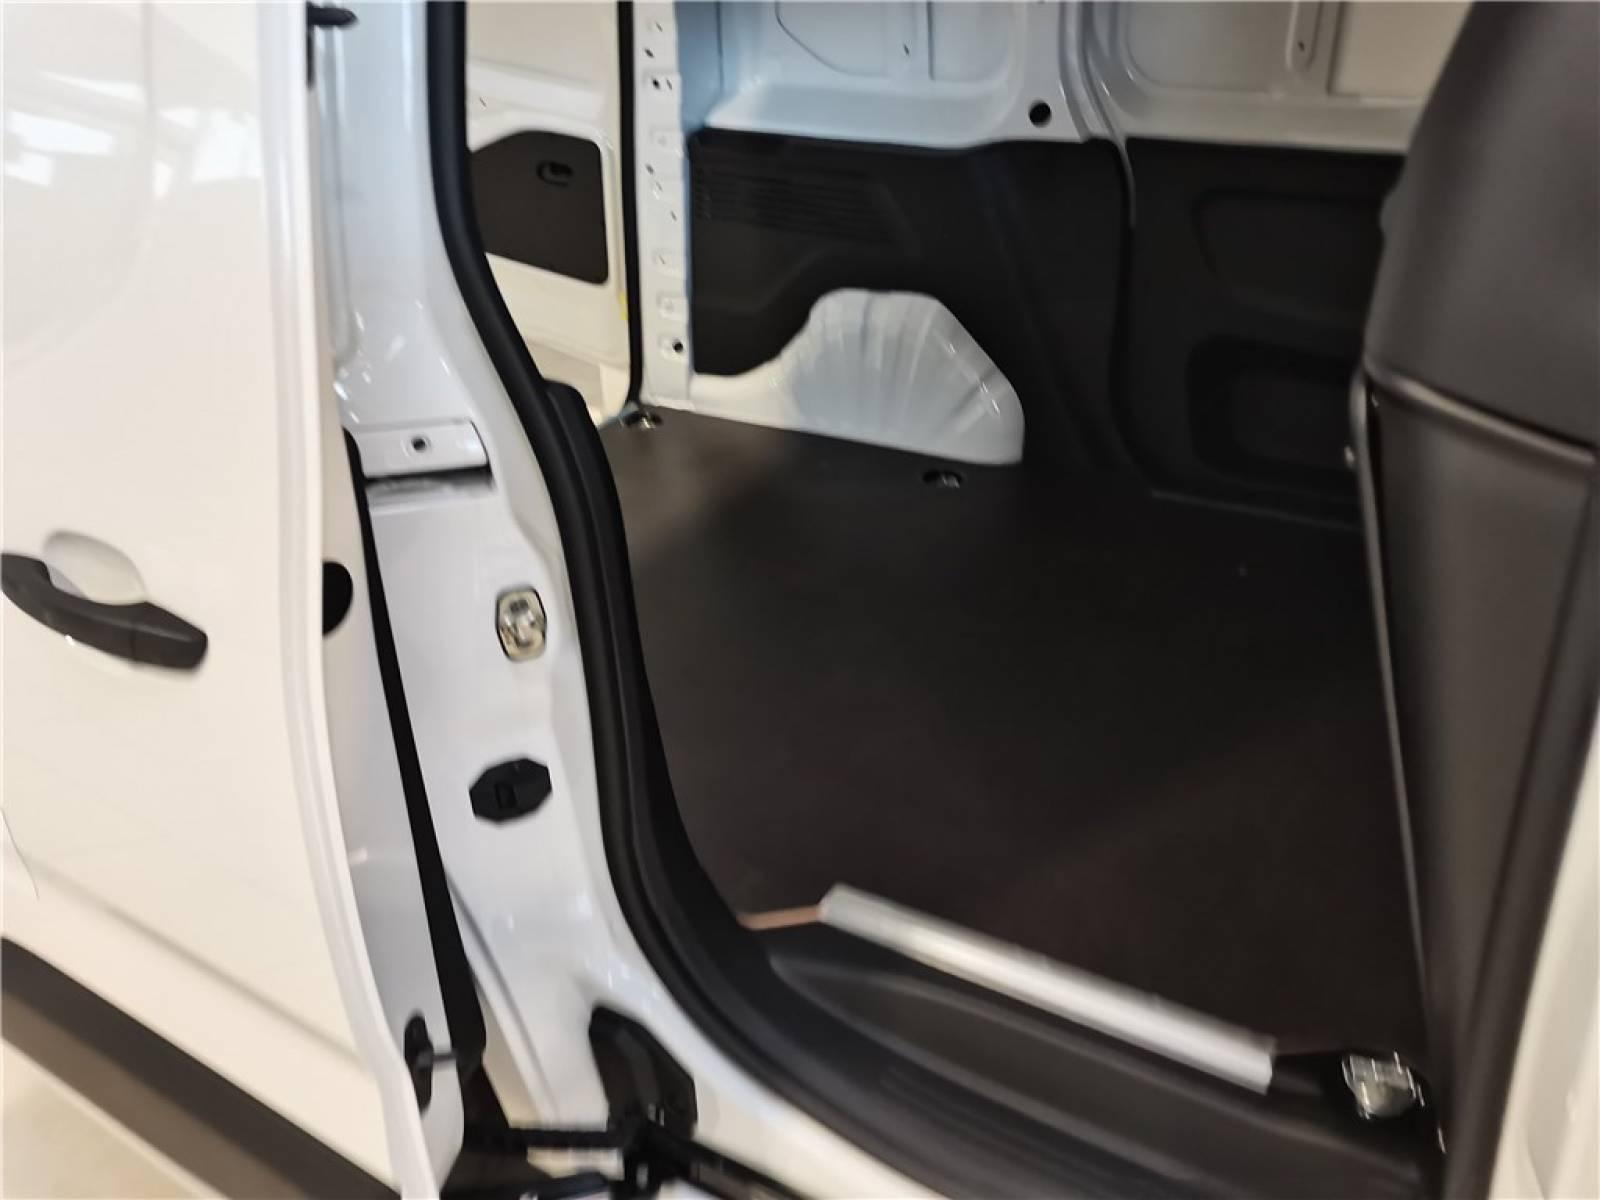 OPEL COMBO CARGO 1.5 100 CH L1H1 STANDARD - véhicule d'occasion - Groupe Guillet - Opel Magicauto - Chalon-sur-Saône - 71380 - Saint-Marcel - 15